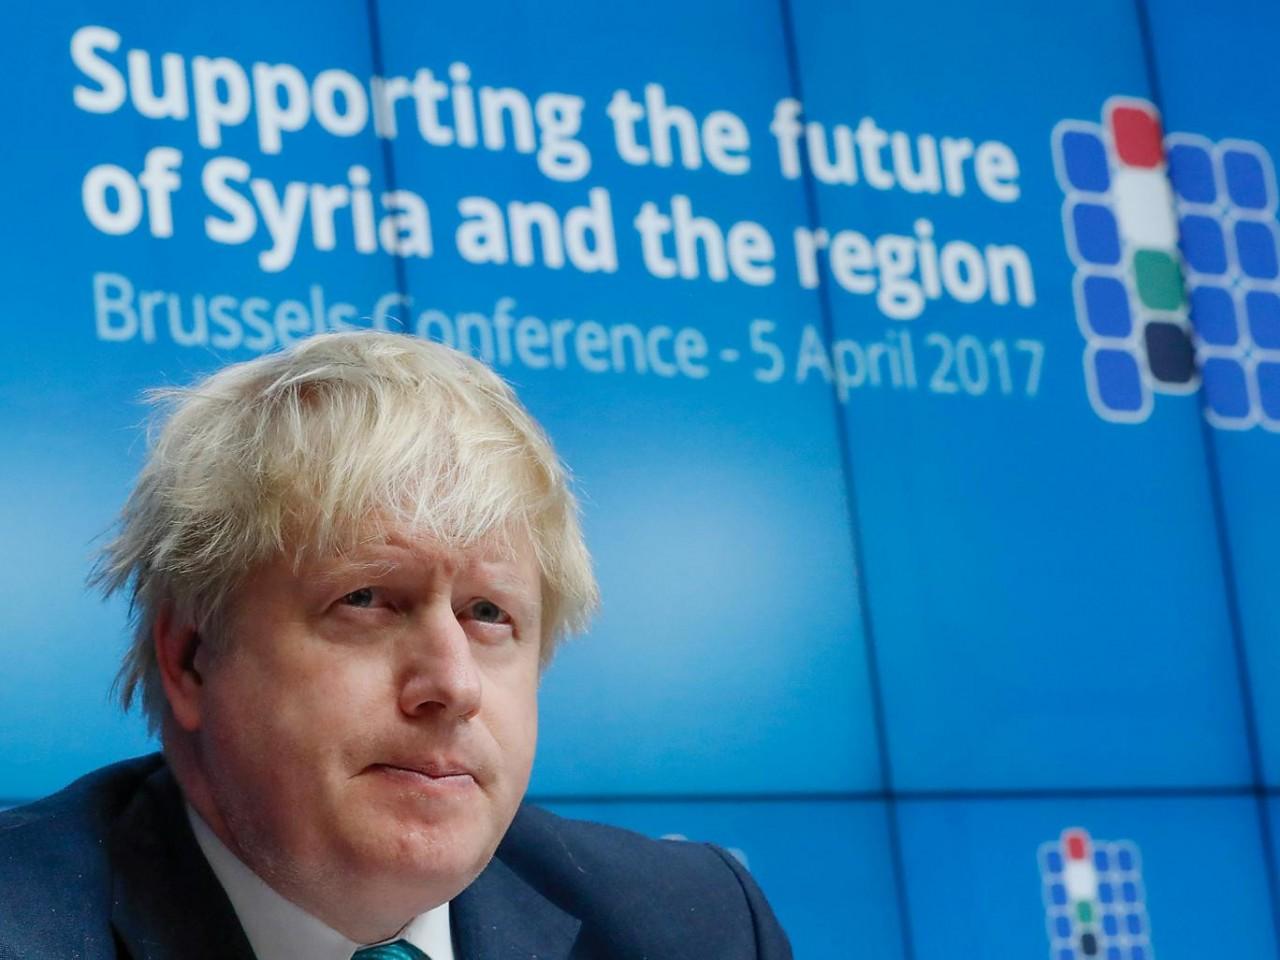 США могут снова ударить по Сирии — Борис Джонсон